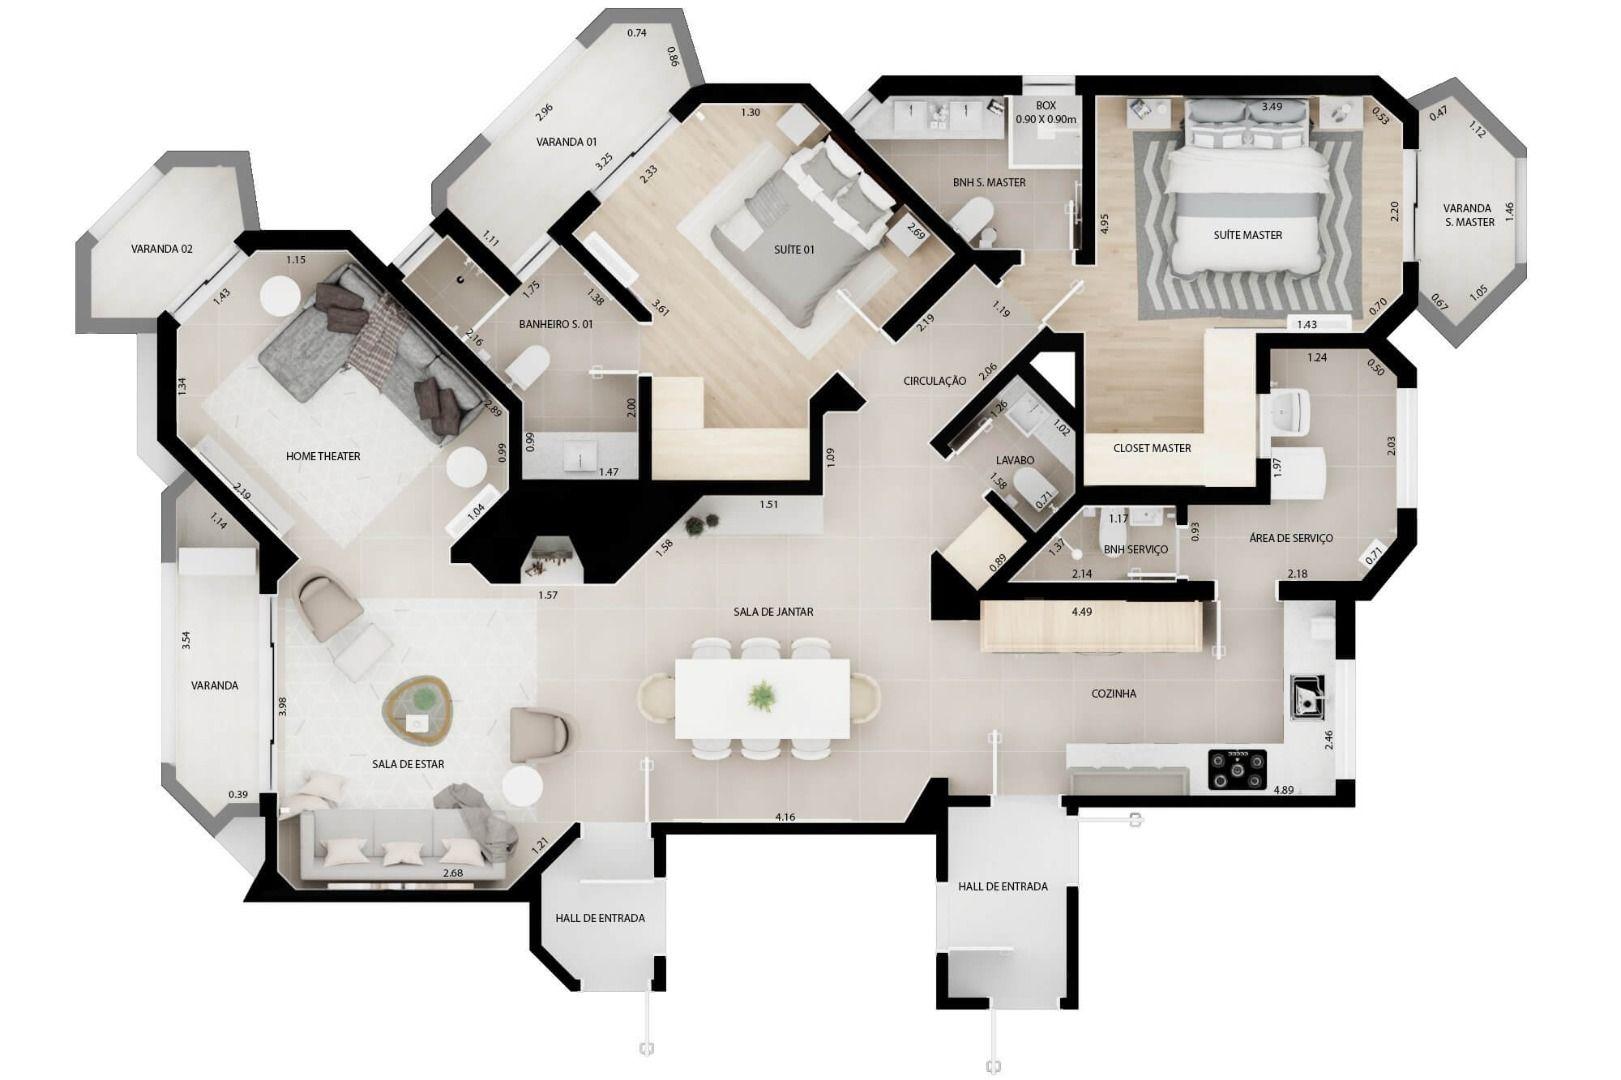 142 M² - 2 SUÍTES. (Apartamento 71, 7º andar).